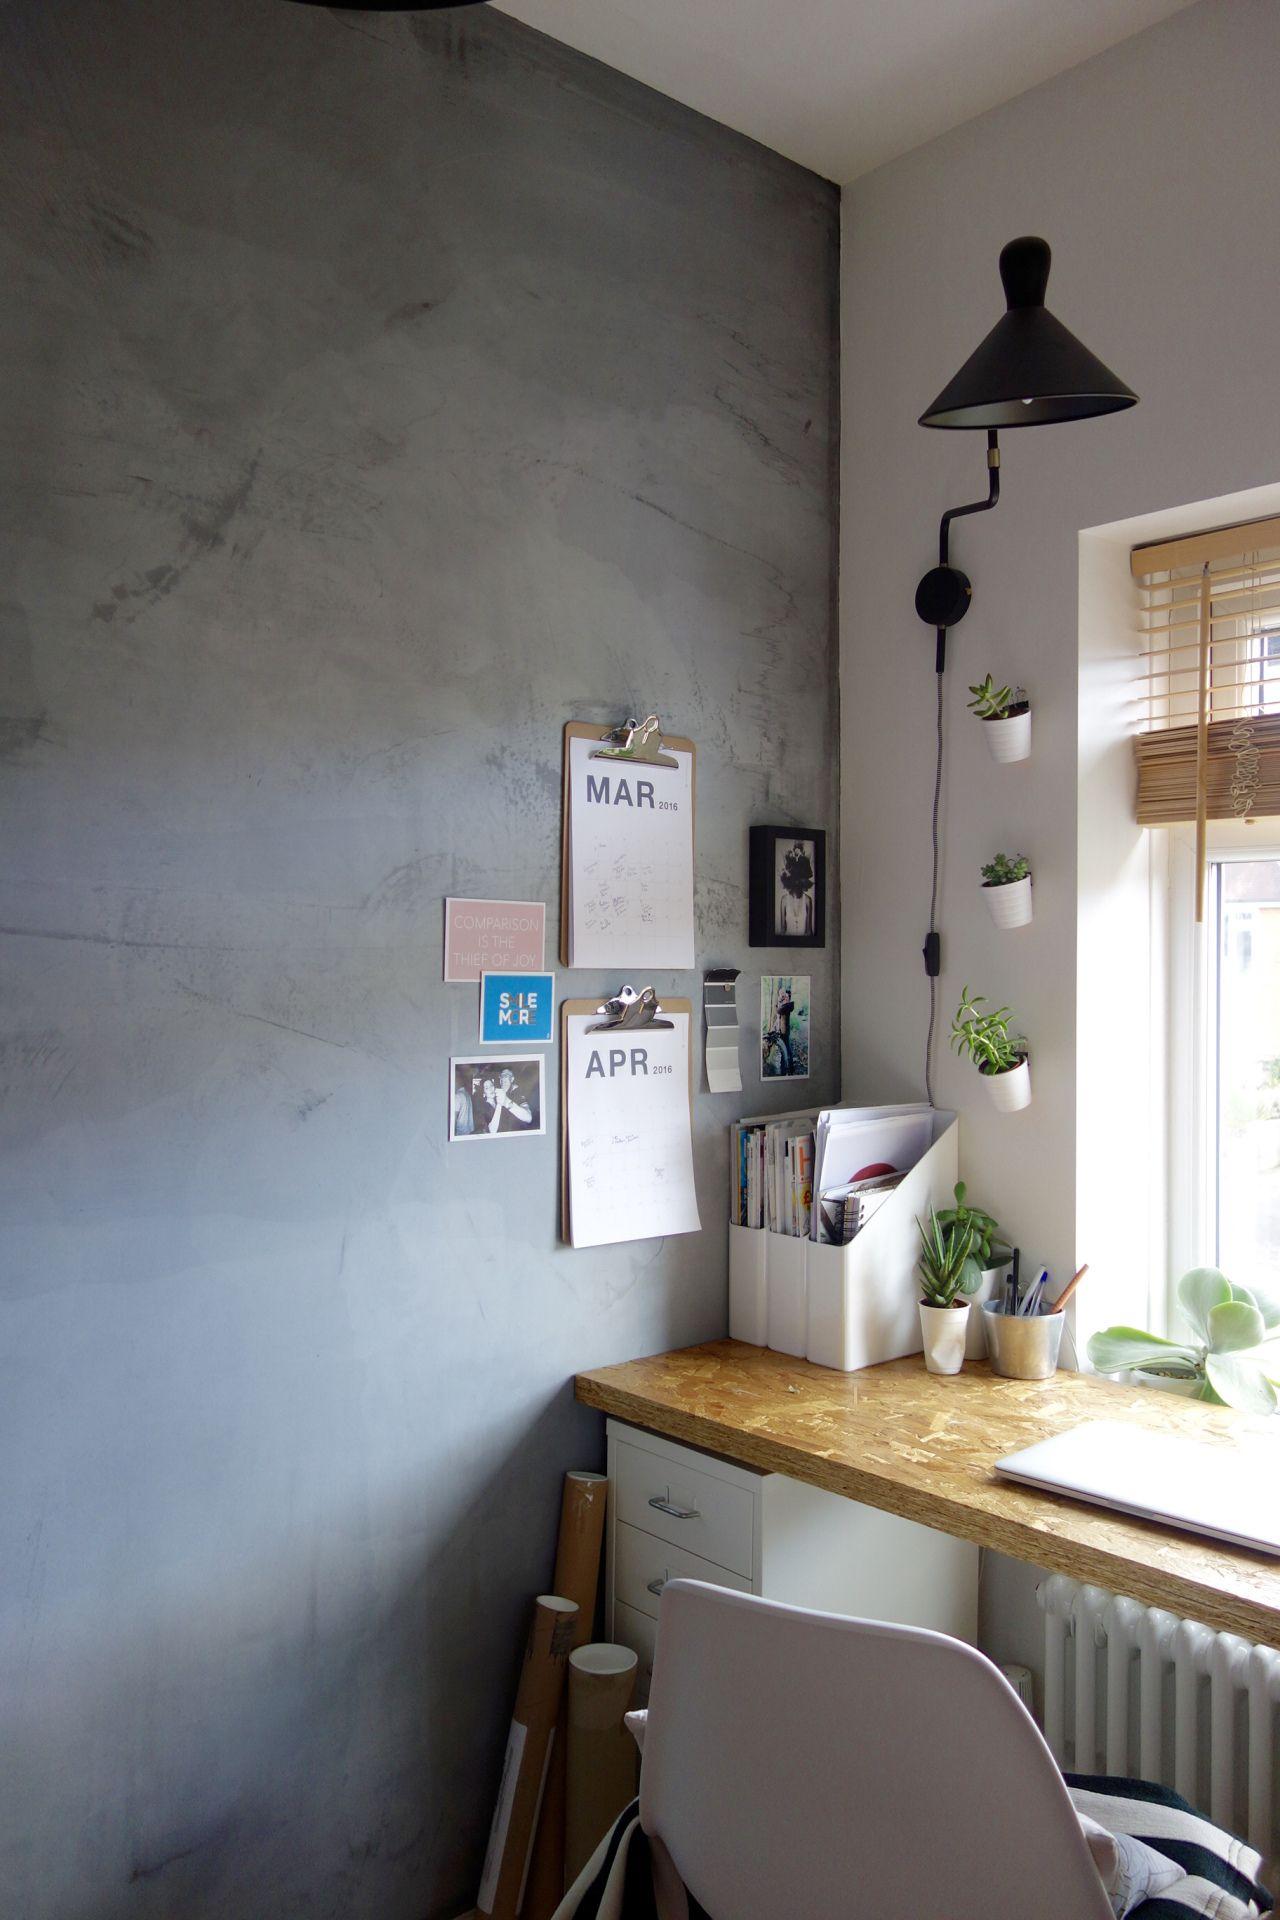 My Concrete Wall Making Spaces Concrete Walls Interior Concrete Walls Diy Concrete Wall